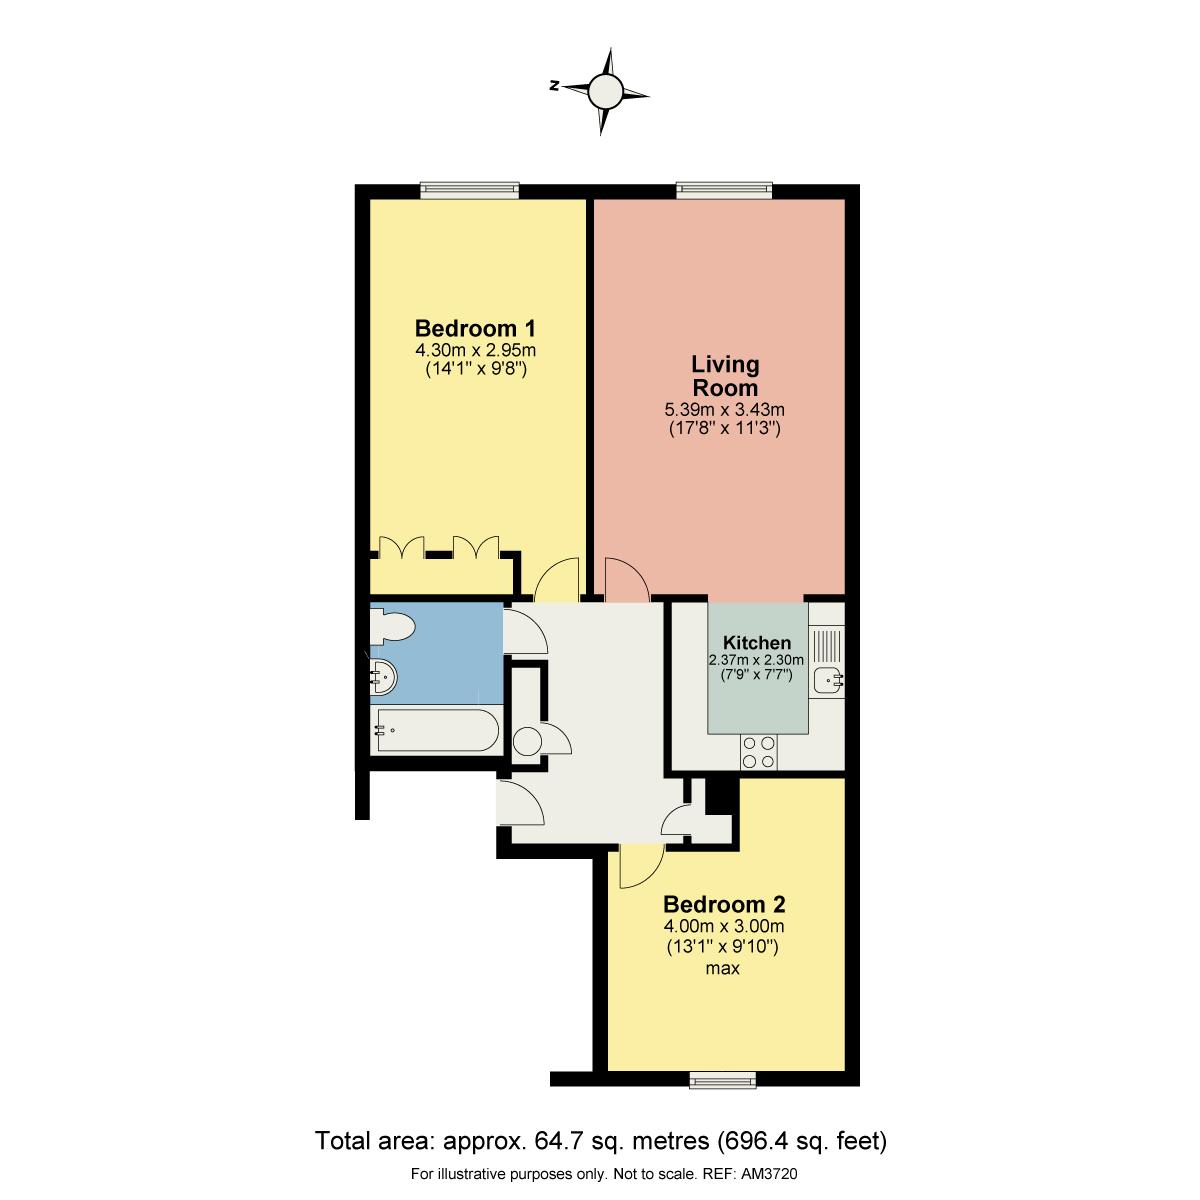 Floorplan 15 Campbell House, Coniston, Cumbria, LA21 8ER